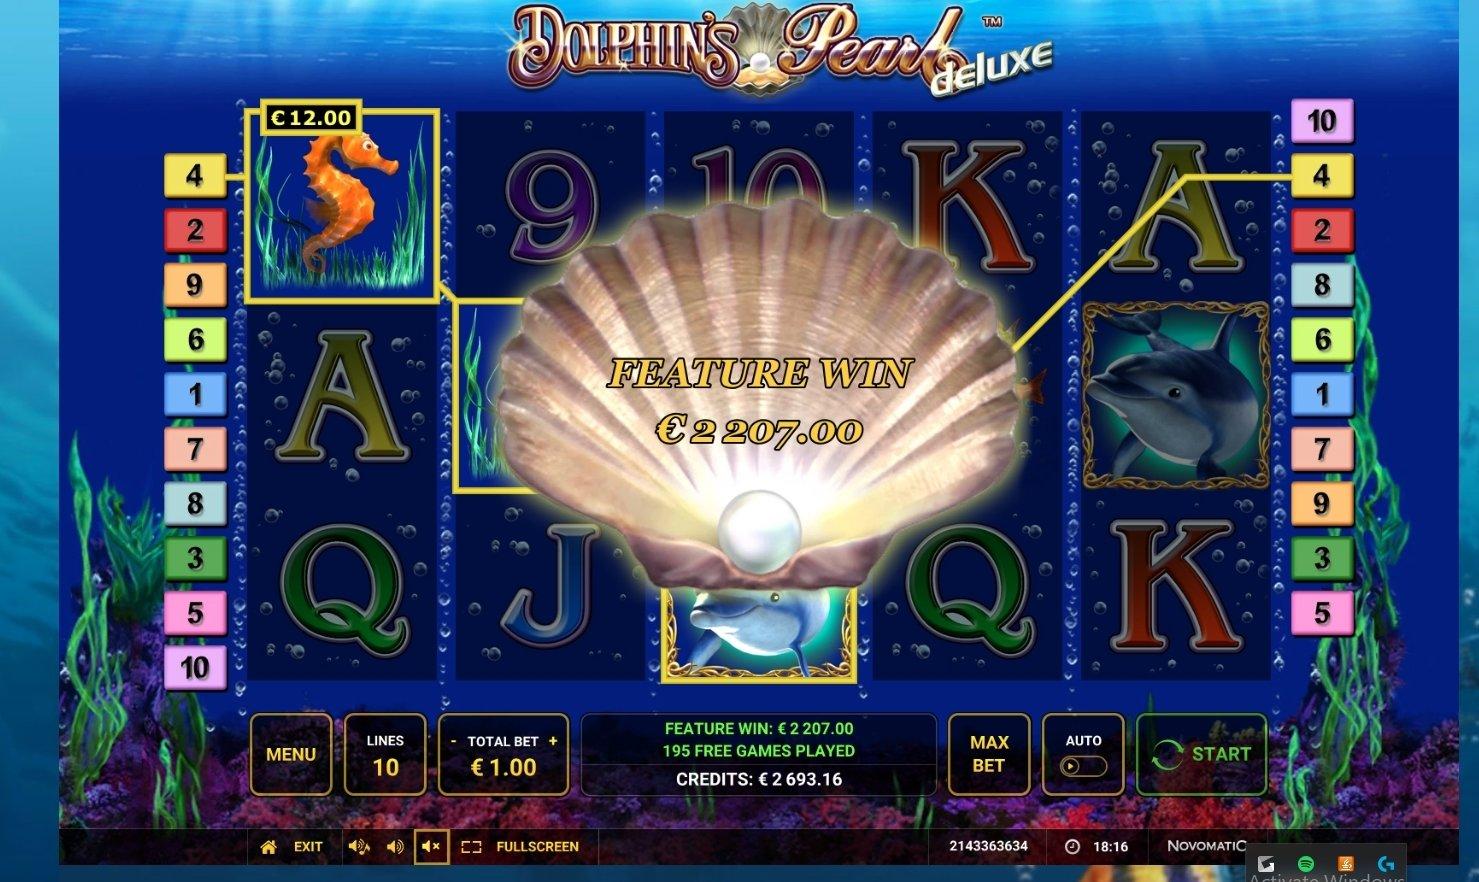 Quatro casino nederlandse vlaggetjes makenzie wilson